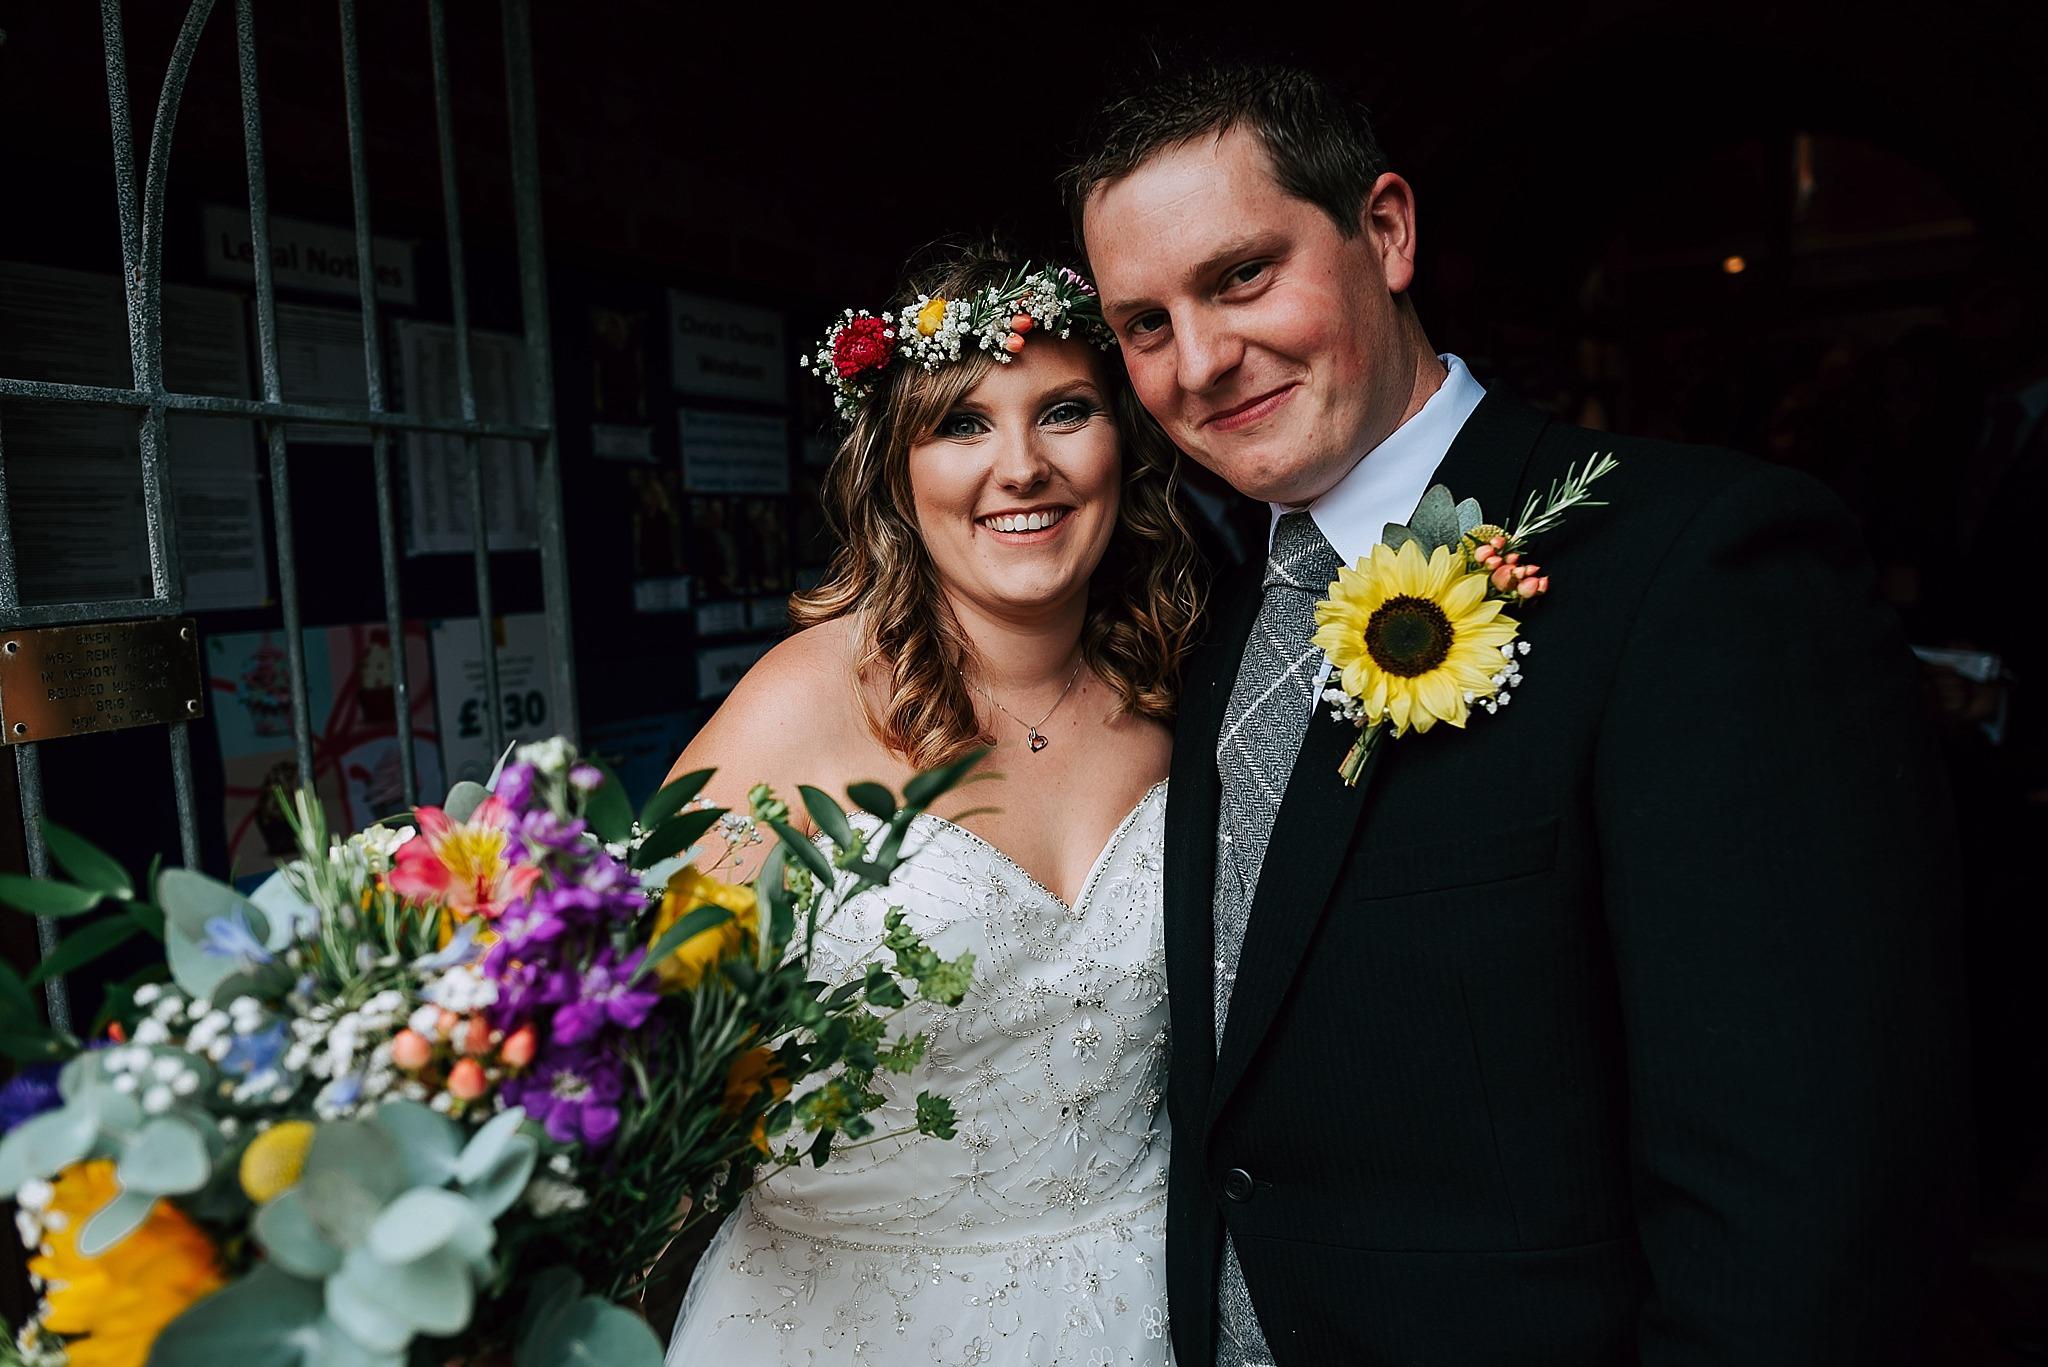 colourful wedding at ribby hall village on fylde coast